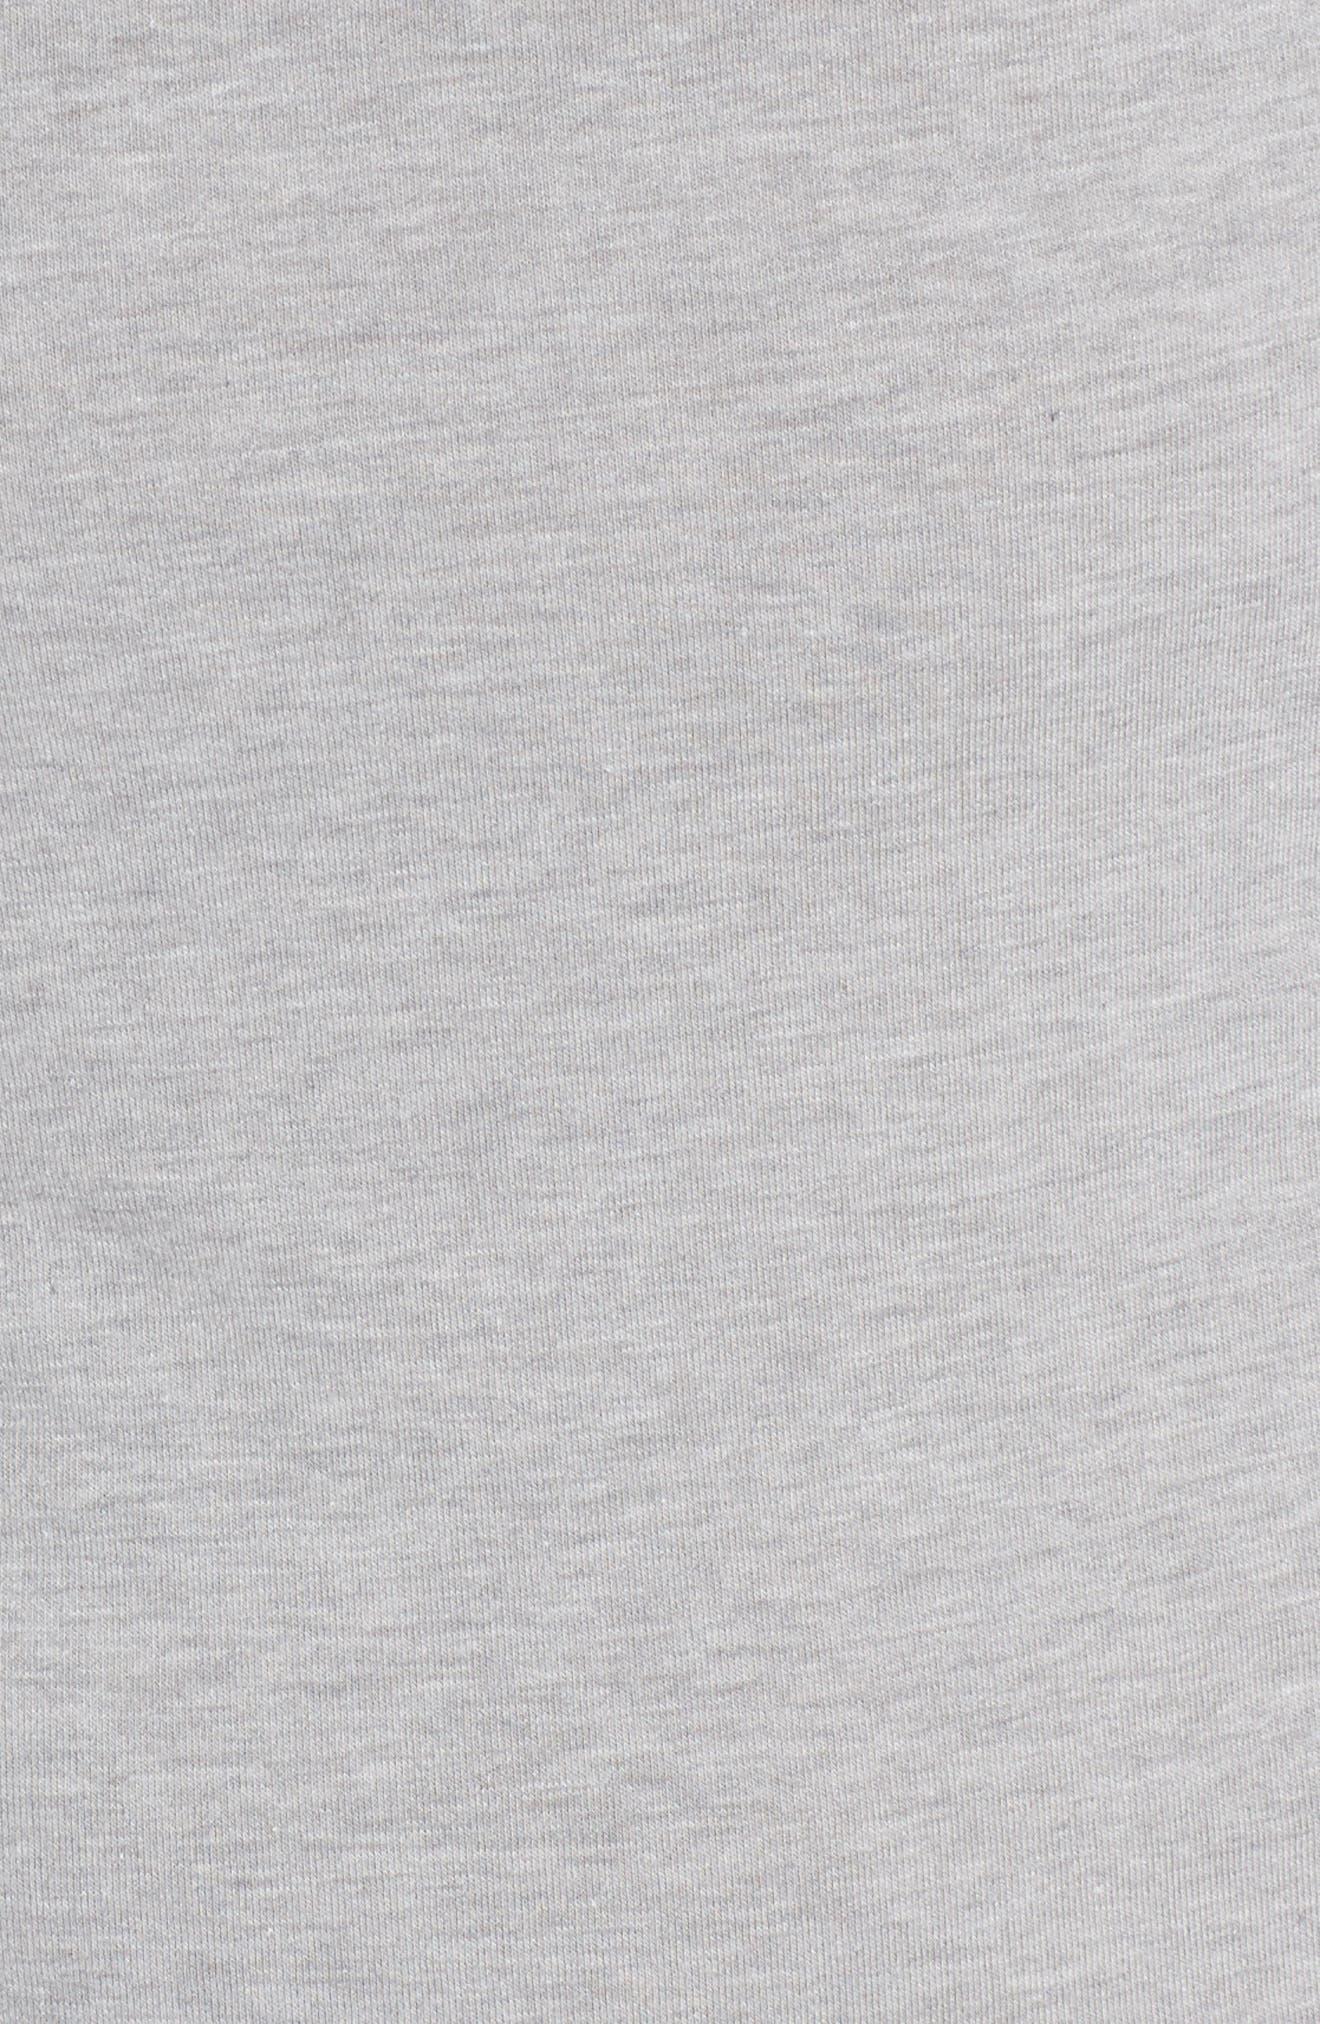 Long Sleeve T-Shirt,                             Alternate thumbnail 5, color,                             Andover Grey